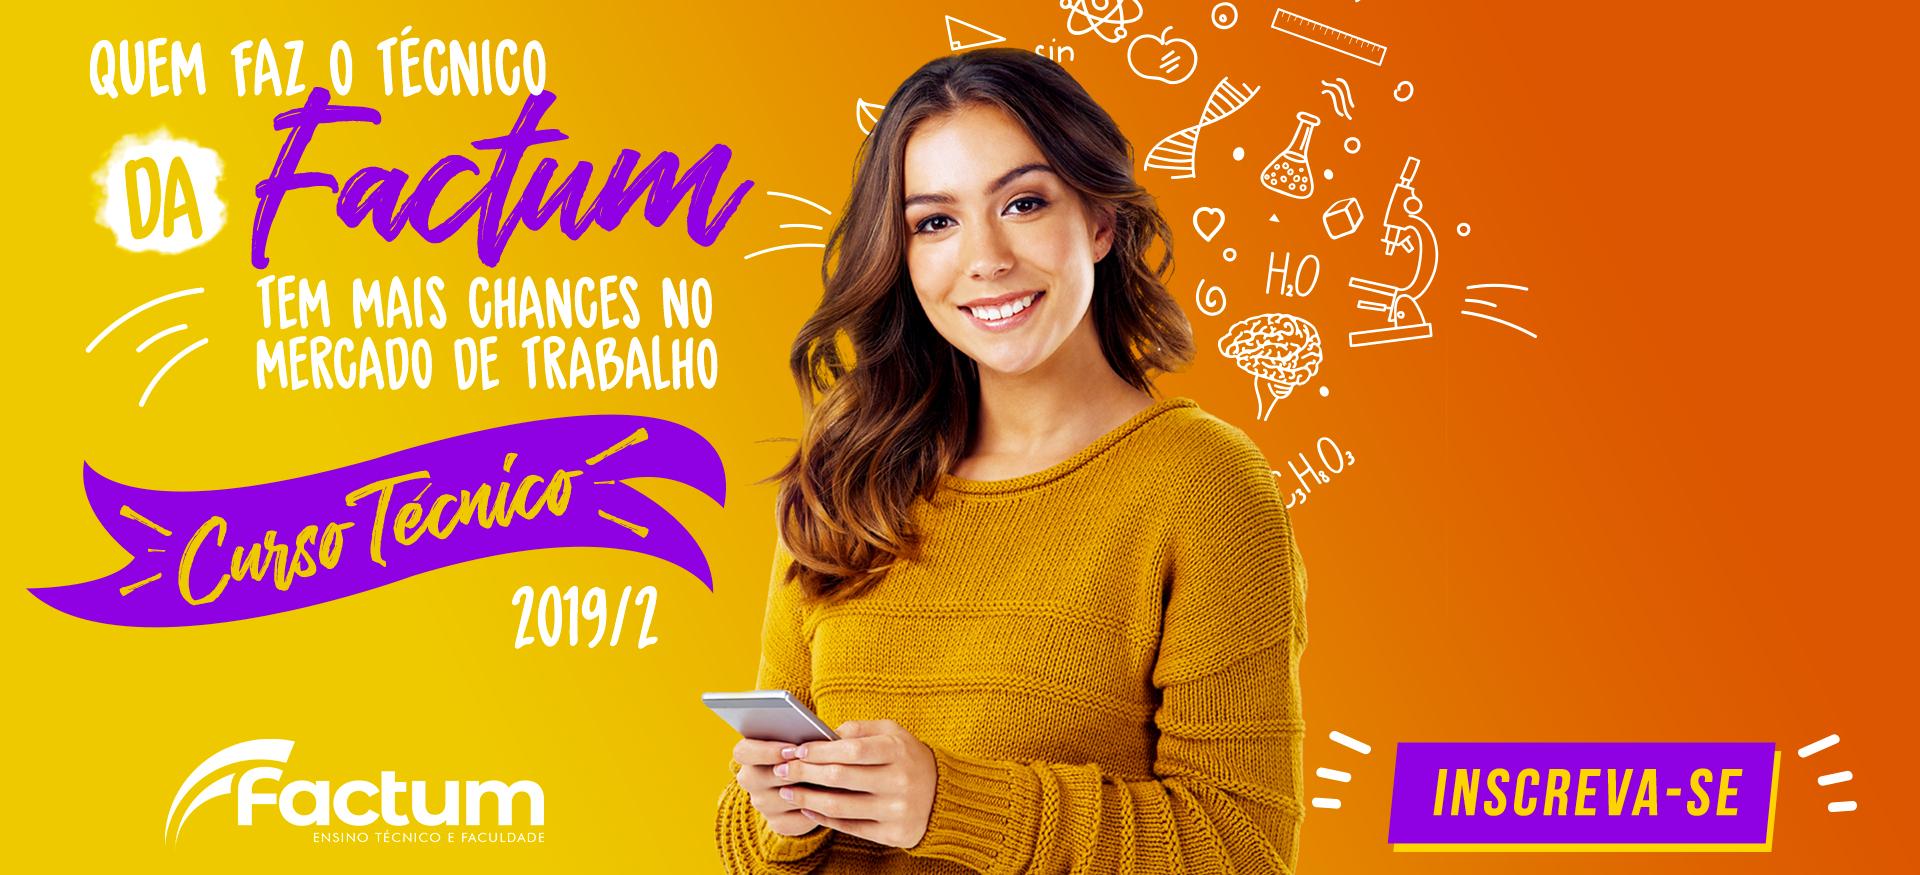 Factum Cursos Técnicos - 2019/2